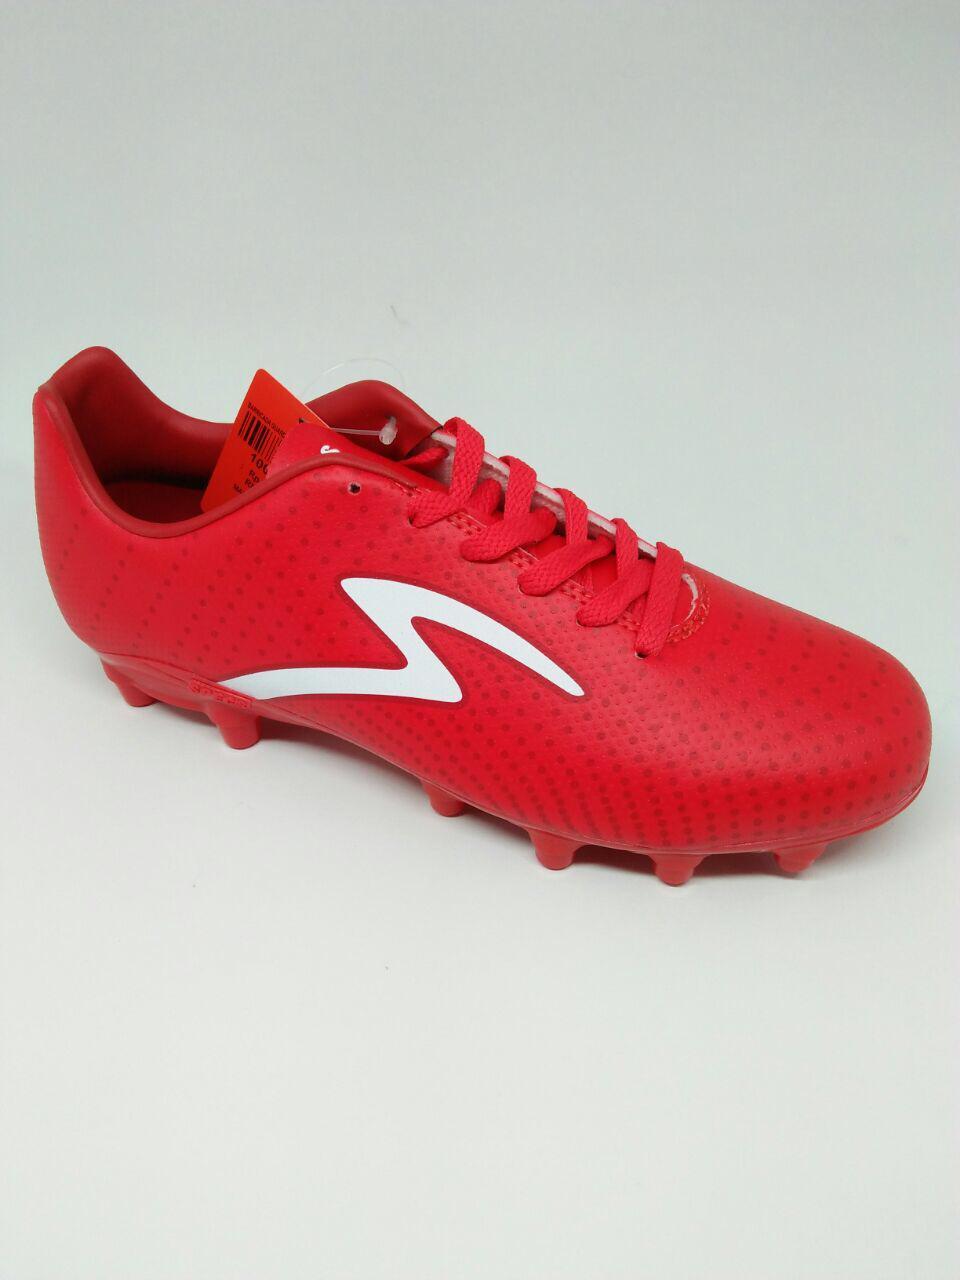 Sepatu bola specs original Barricada Guardian FG merah new 2018